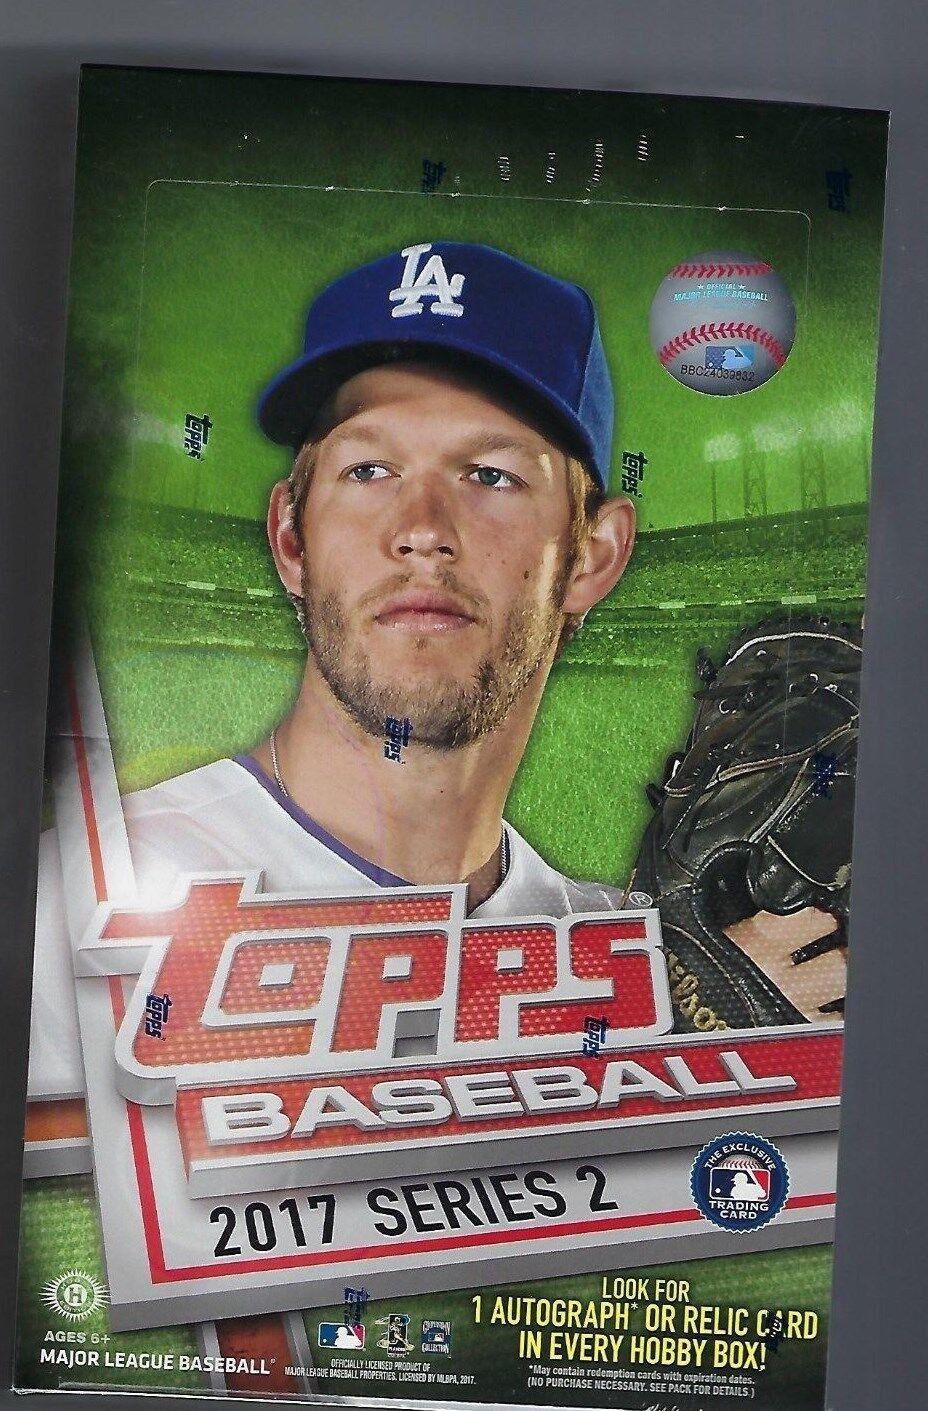 Купить 2017 Topps Series 2 Baseball FACTORY SEALED Hobby Box